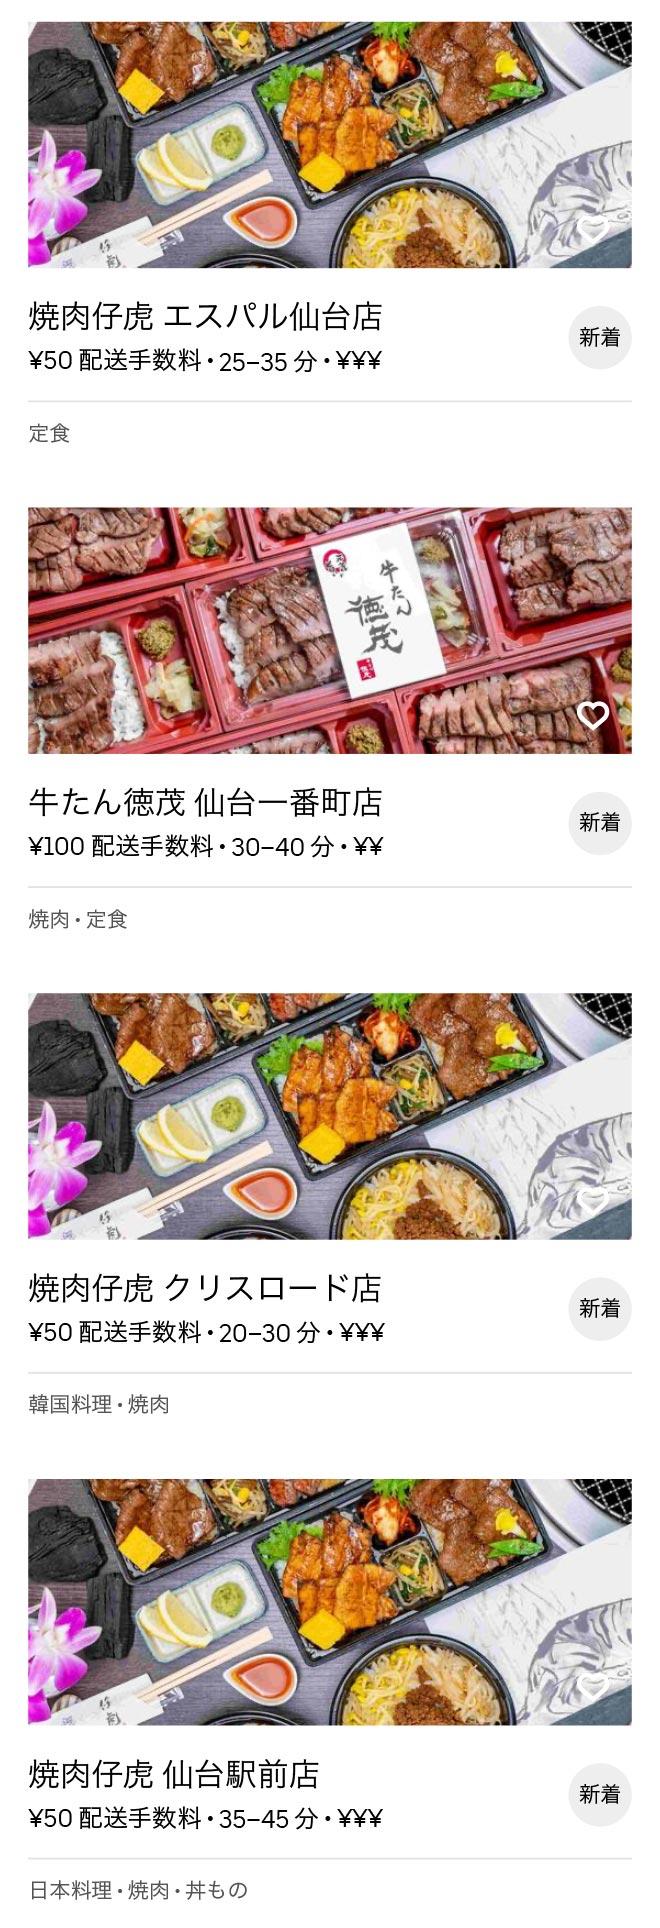 Sendai menu 2008 01